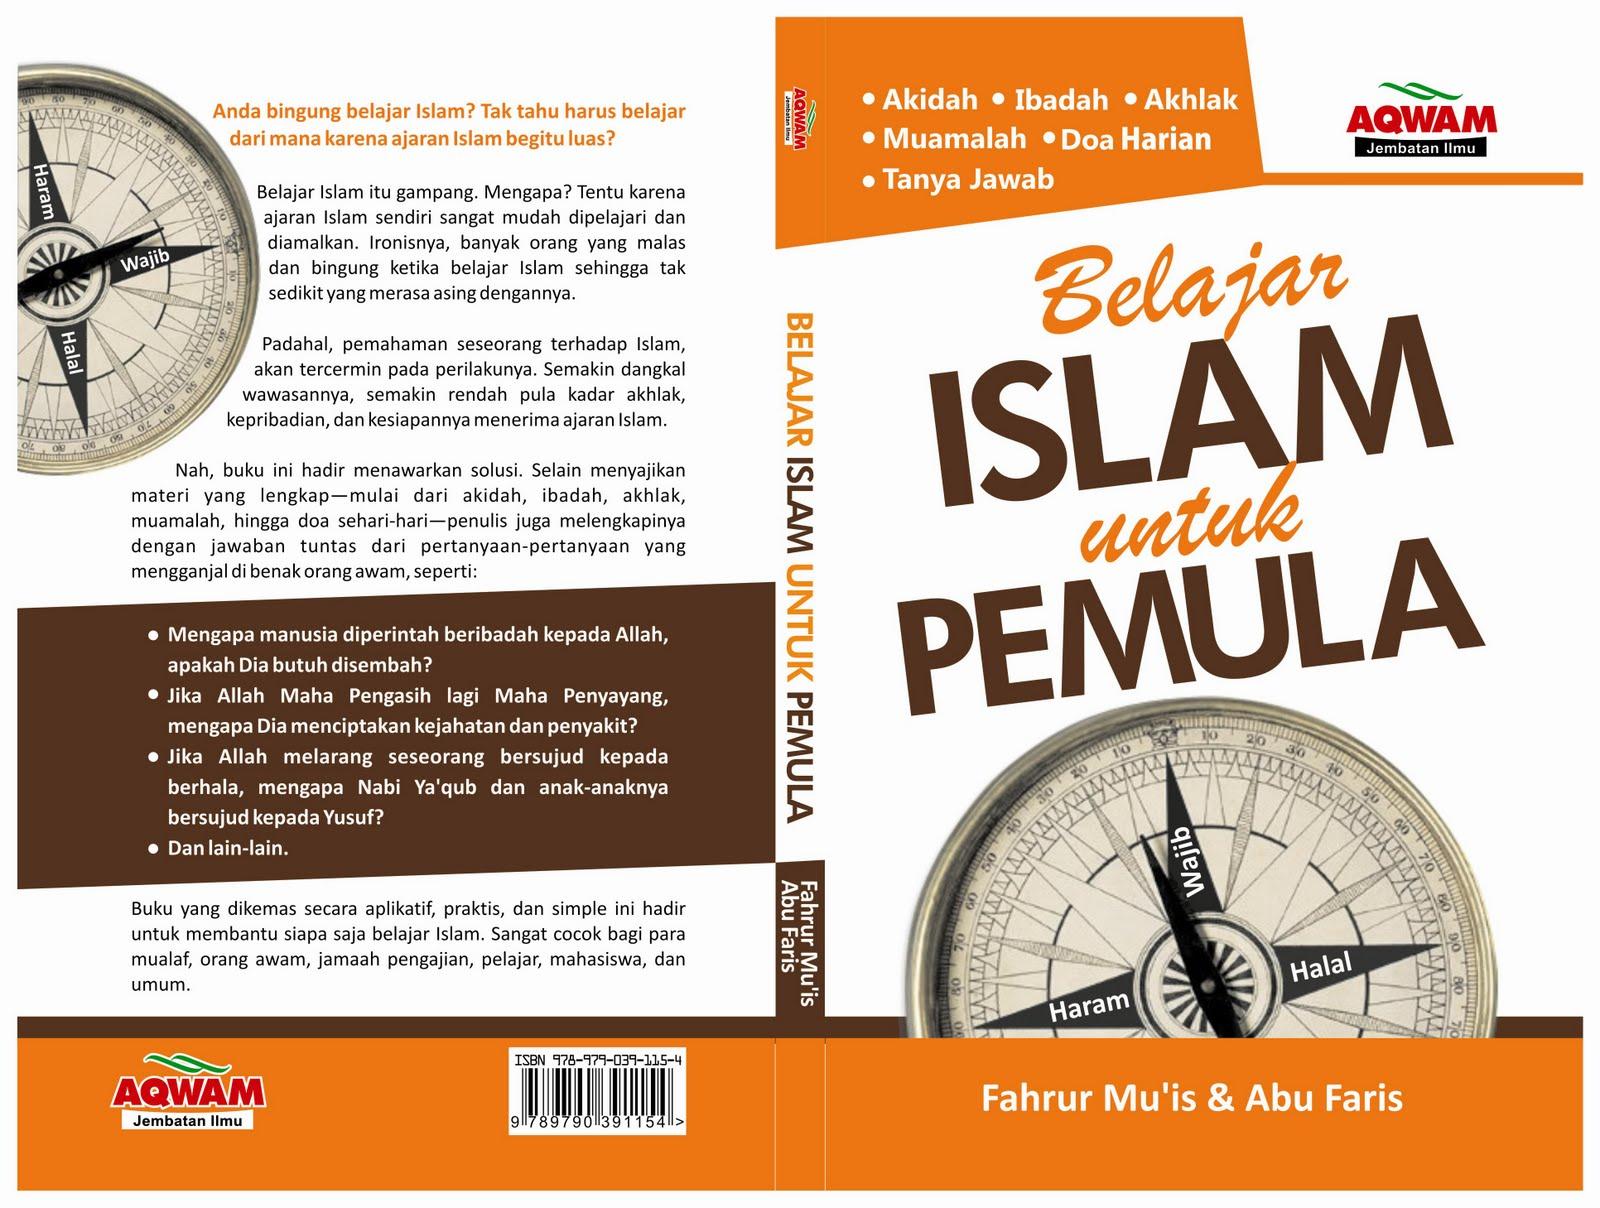 Belajar islam mulai dari nolvadex